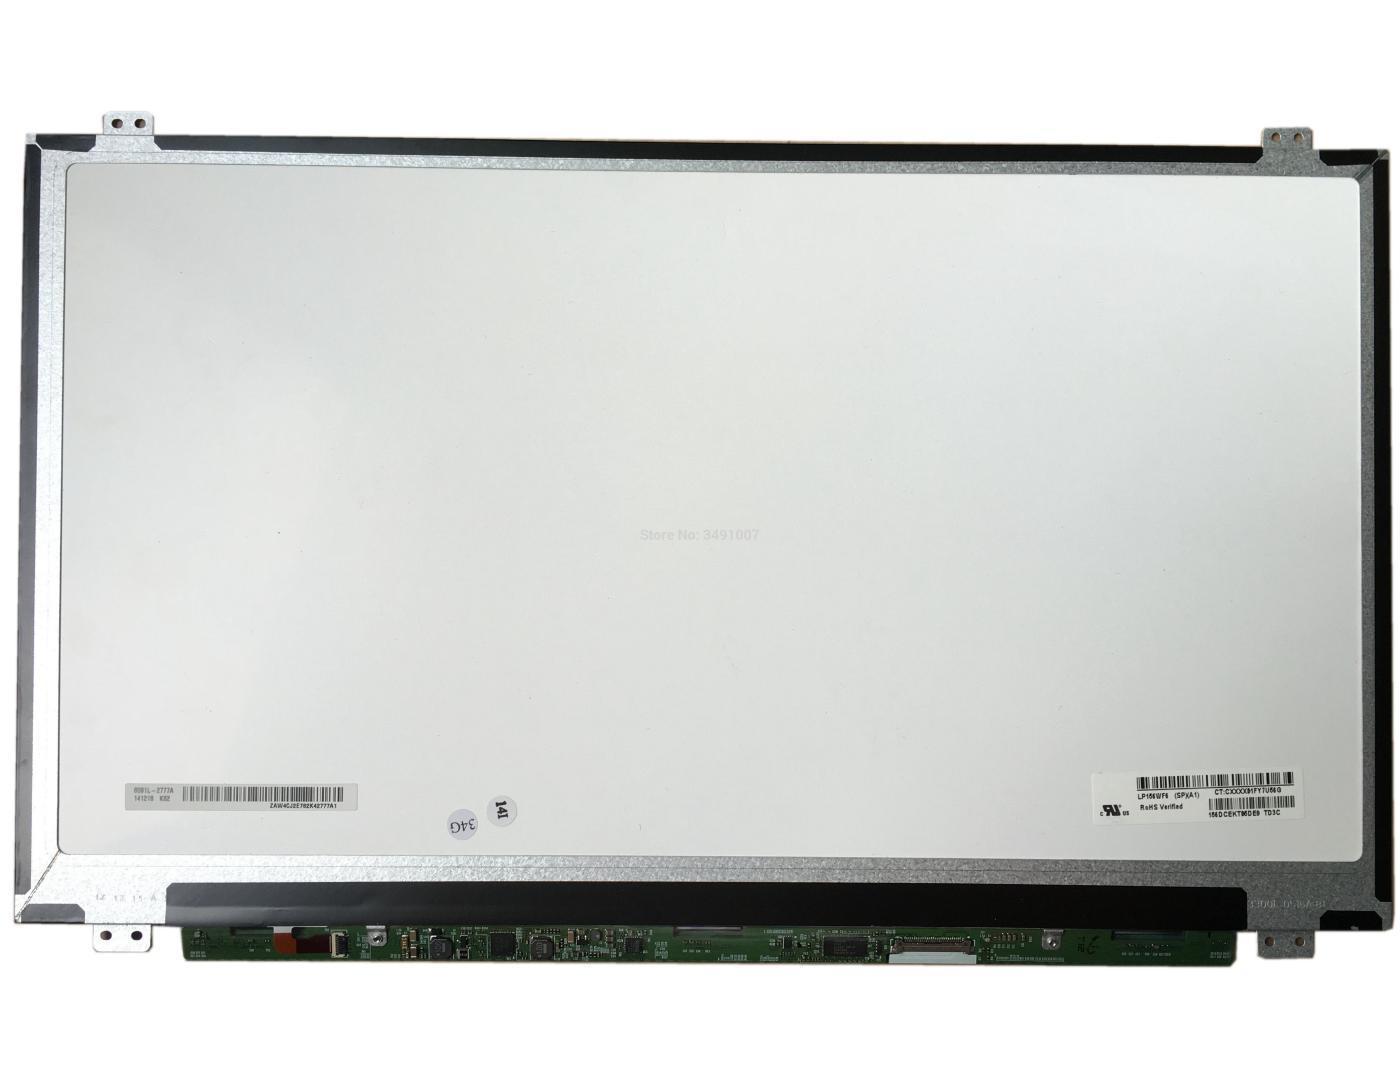 CENTRALINA CONTROLLO S4960A1008B 3091044